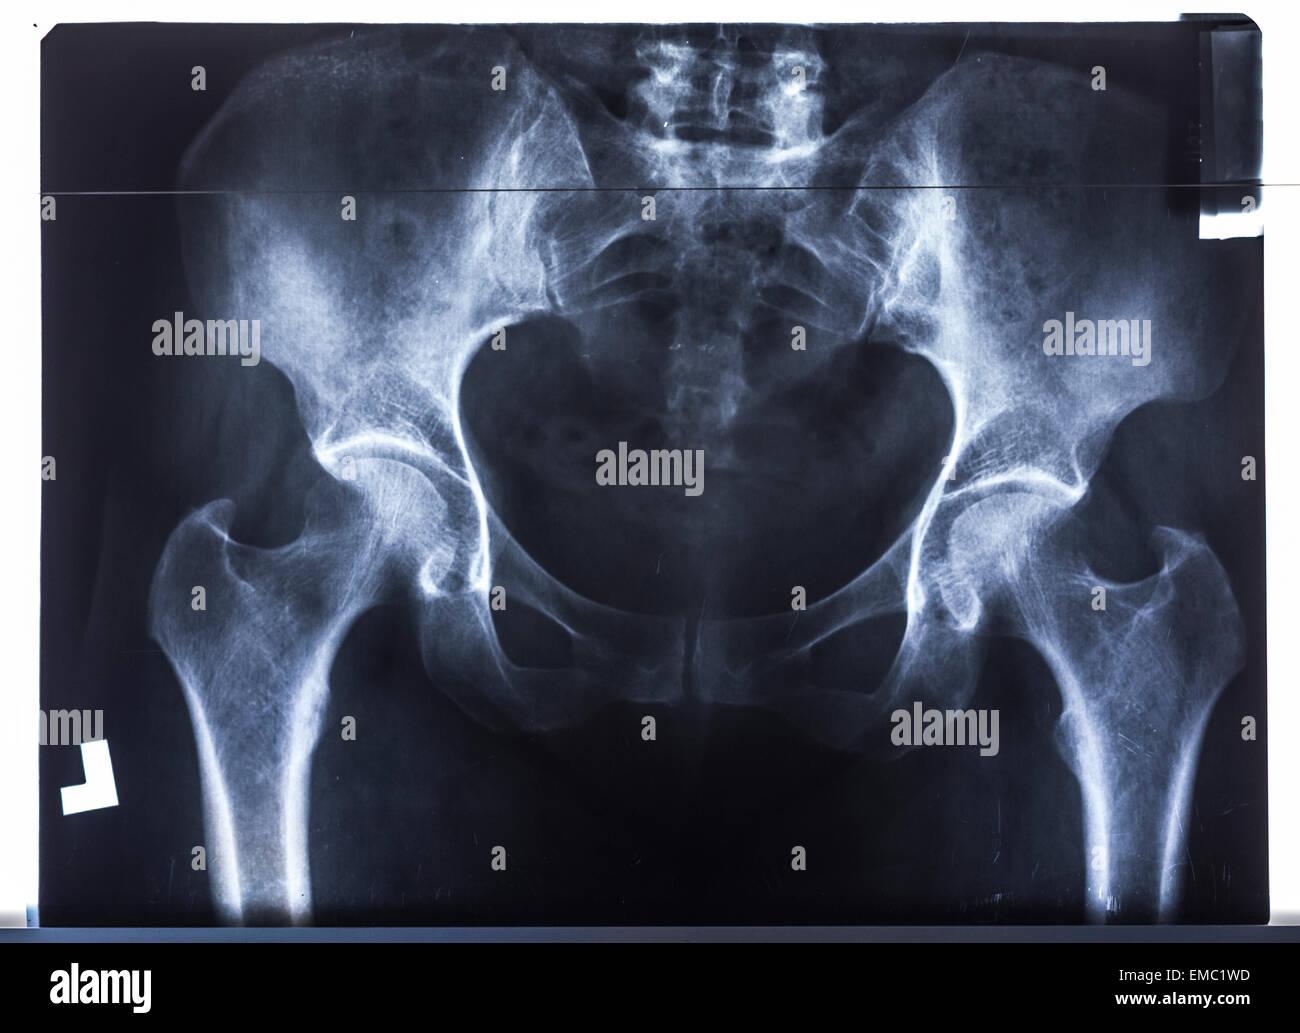 Pelvis x-ray - Stock Image